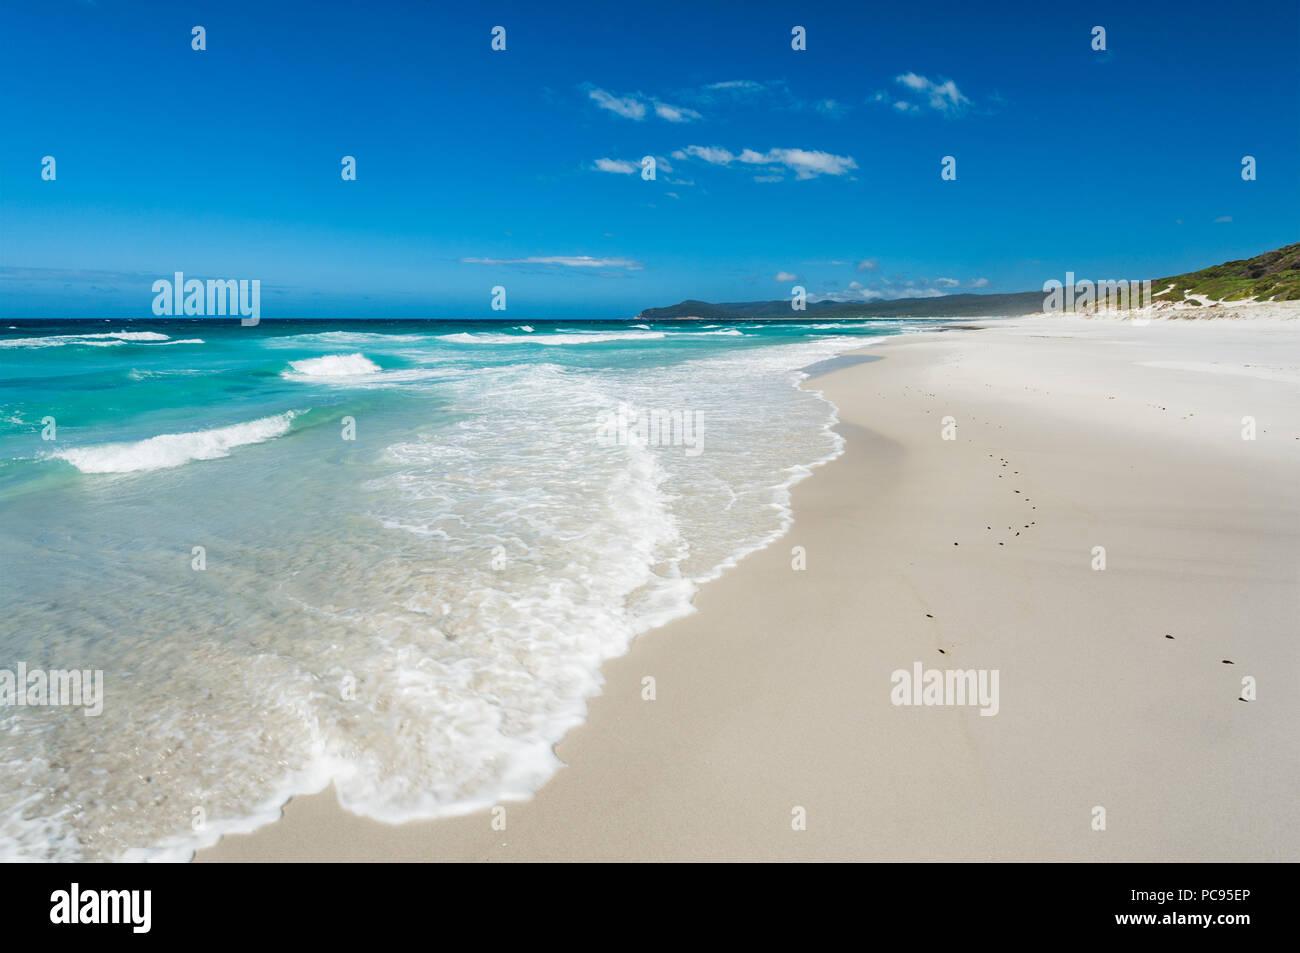 Schöner Strand Landschaft Strände im Freycinet National Park. Stockbild